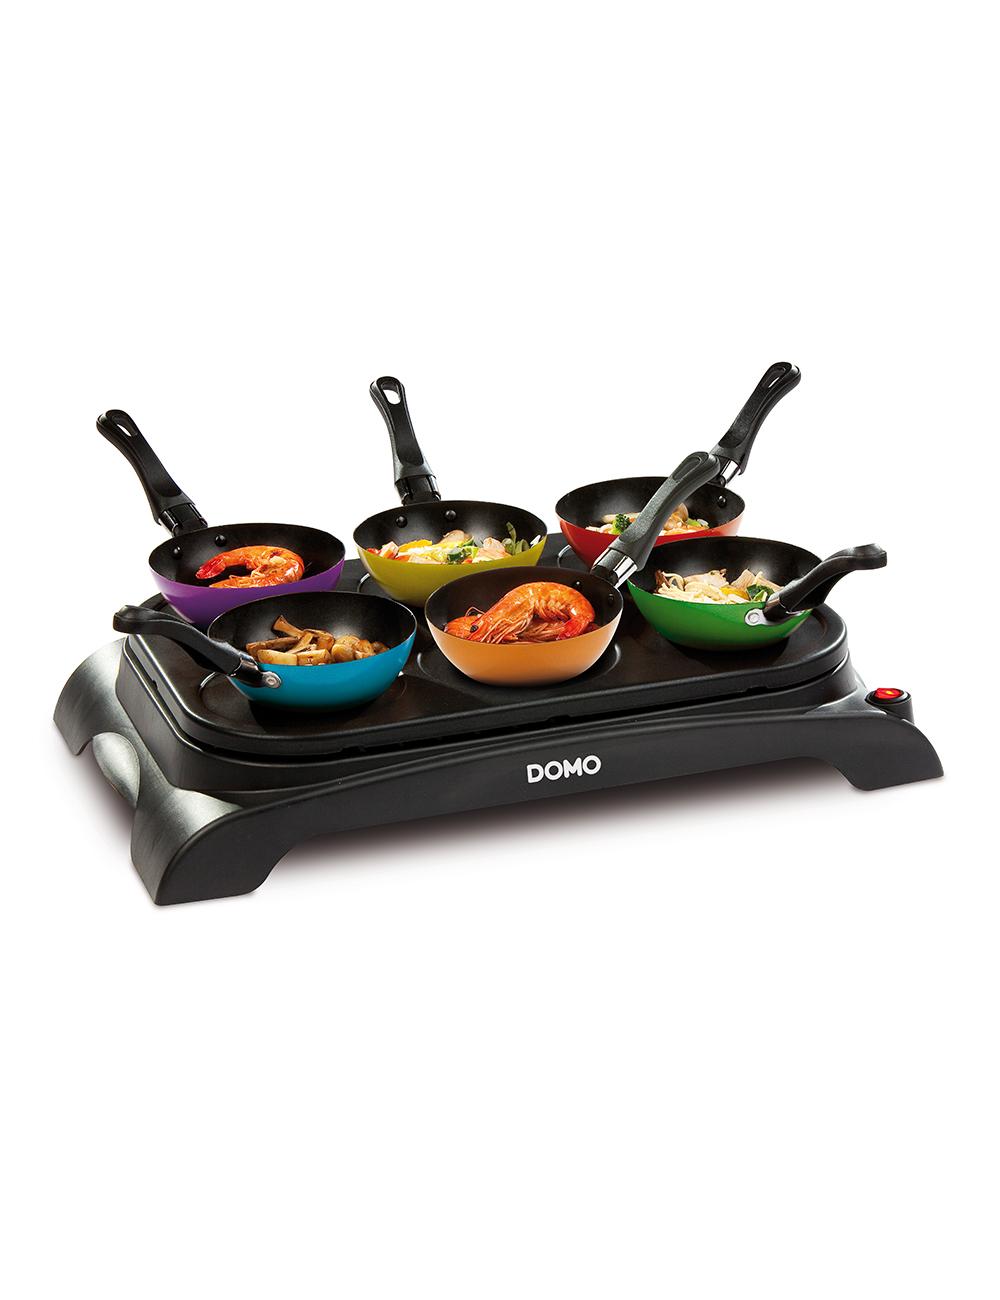 Wok cr pes party de domo 2 en 1 avec 6 mini woks for Domo matelas